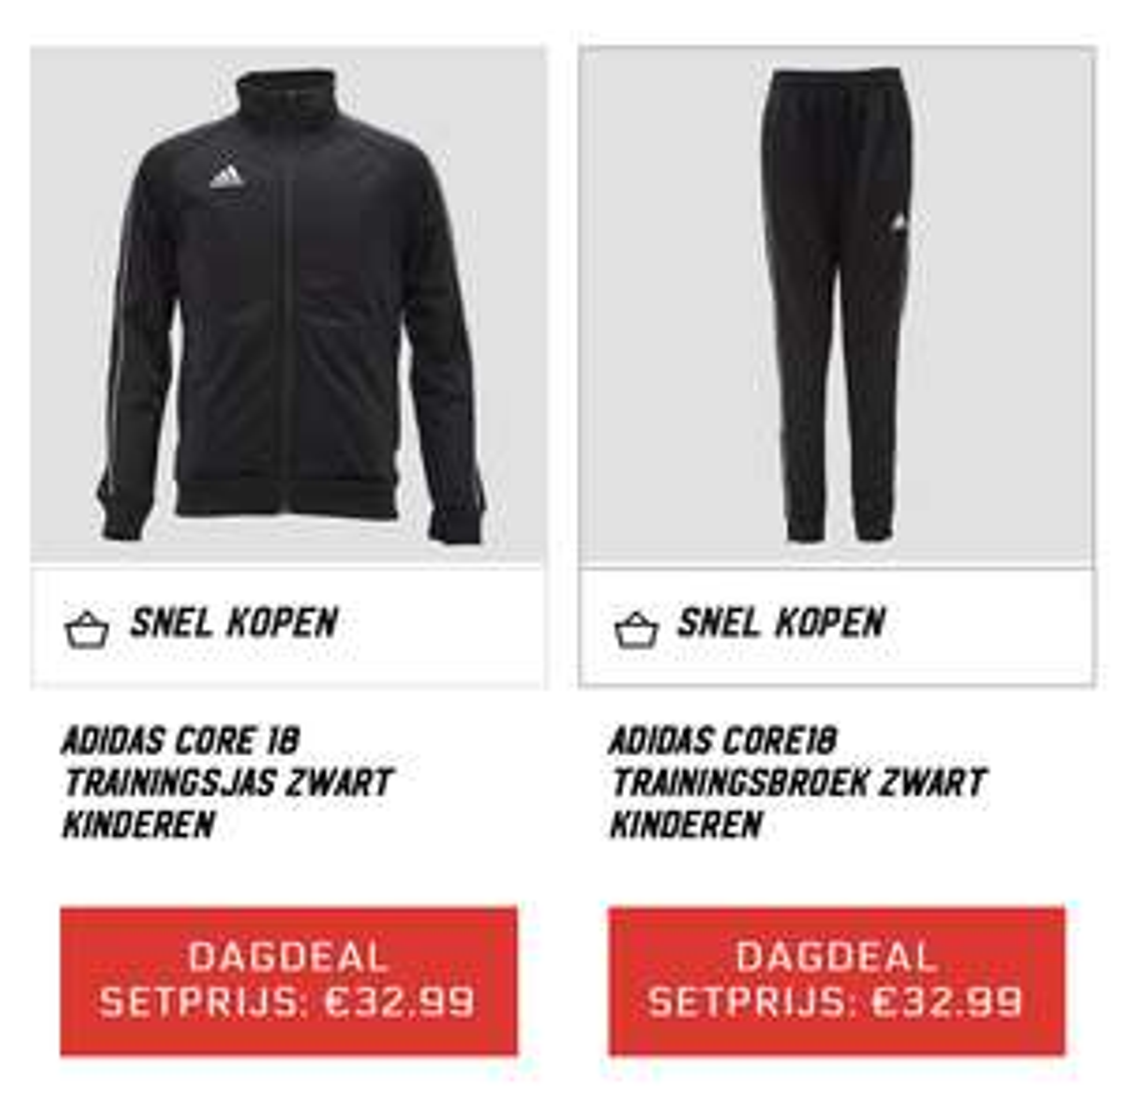 Dagdeal AktieSport; Adidas trainingspak